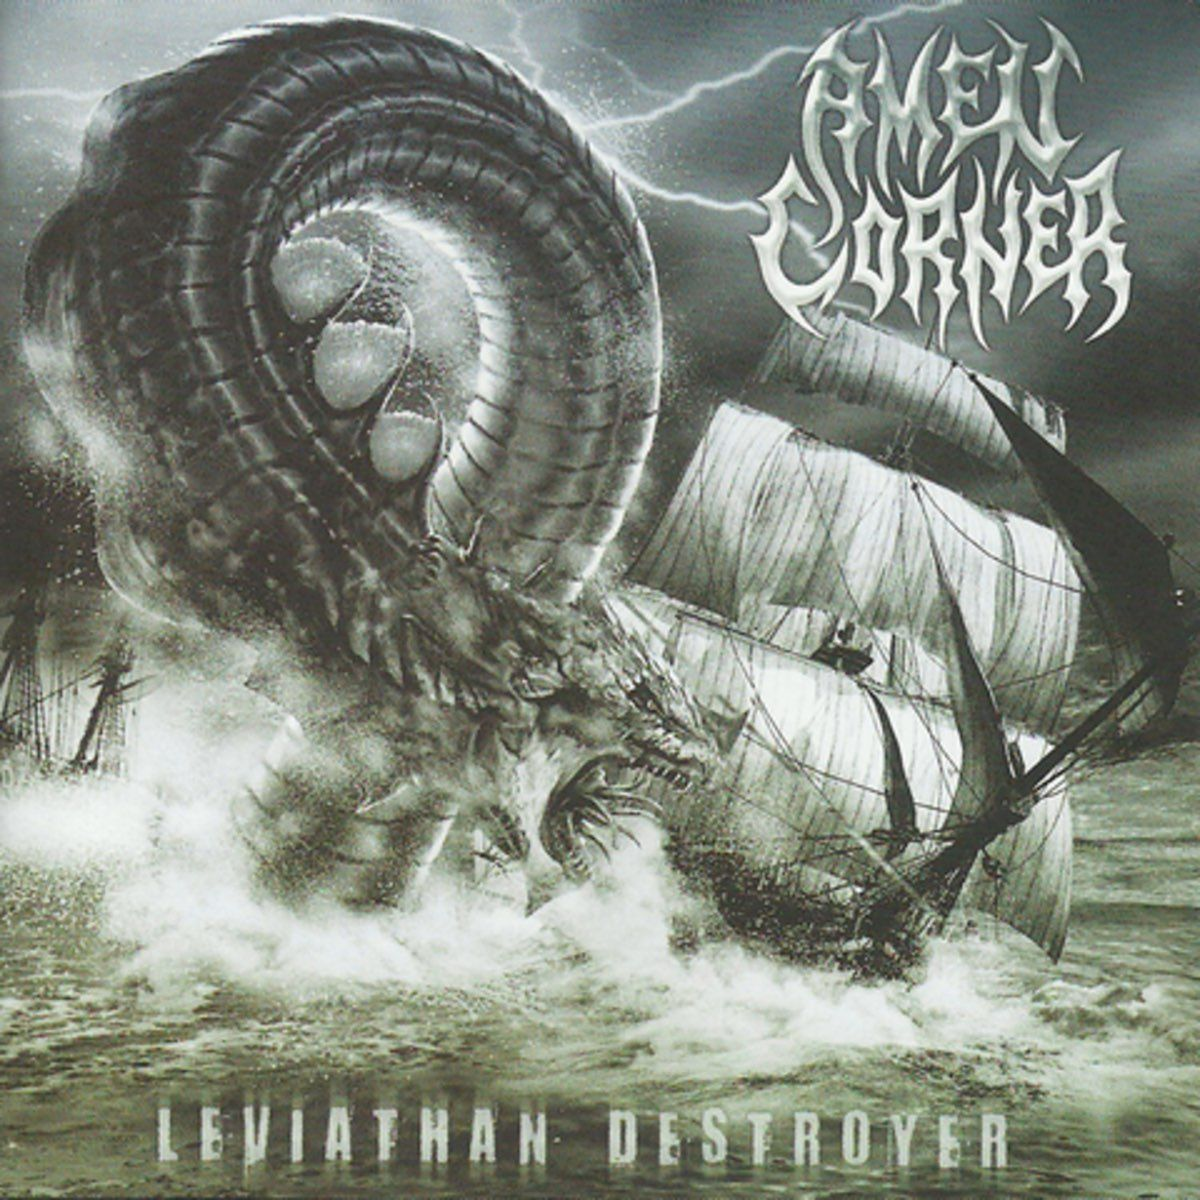 Review for Amen Corner - Leviathan Destroyer